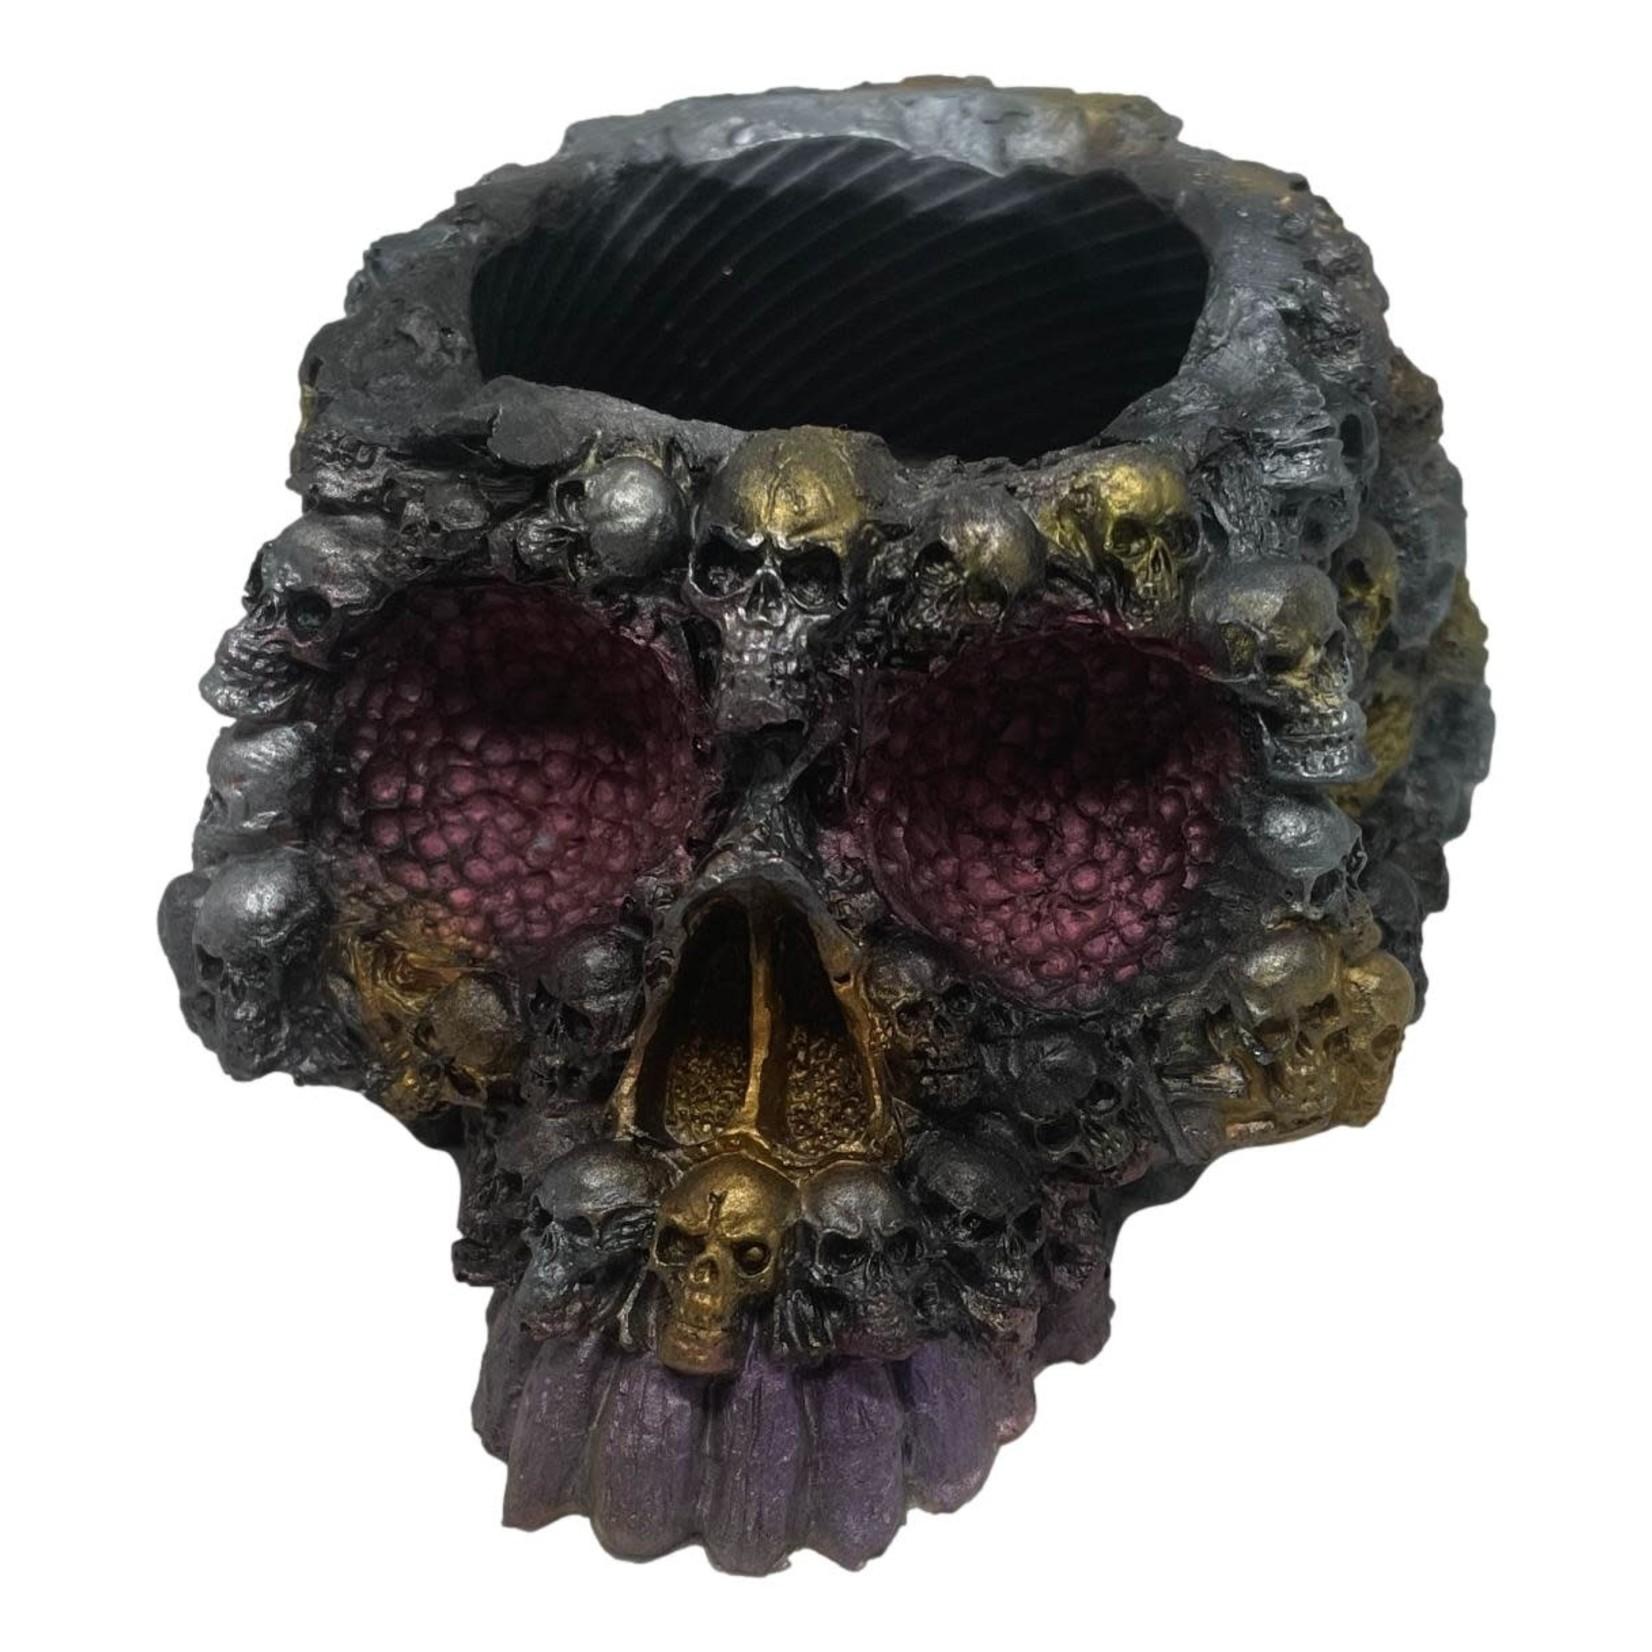 East Coast Sirens Skull Planter in Black, Silver & Gold